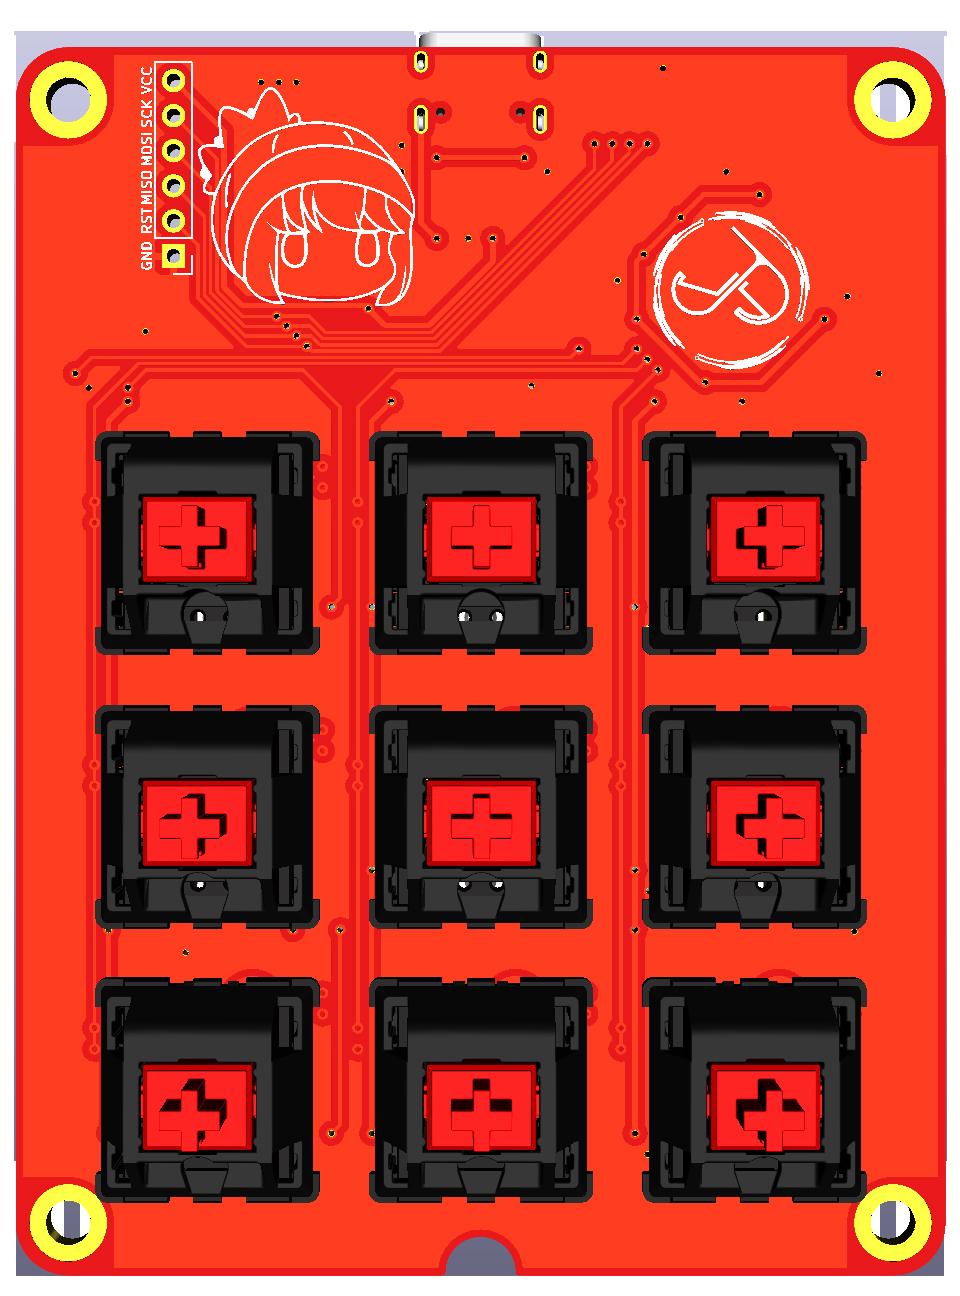 Jeremy Macropad PCB design